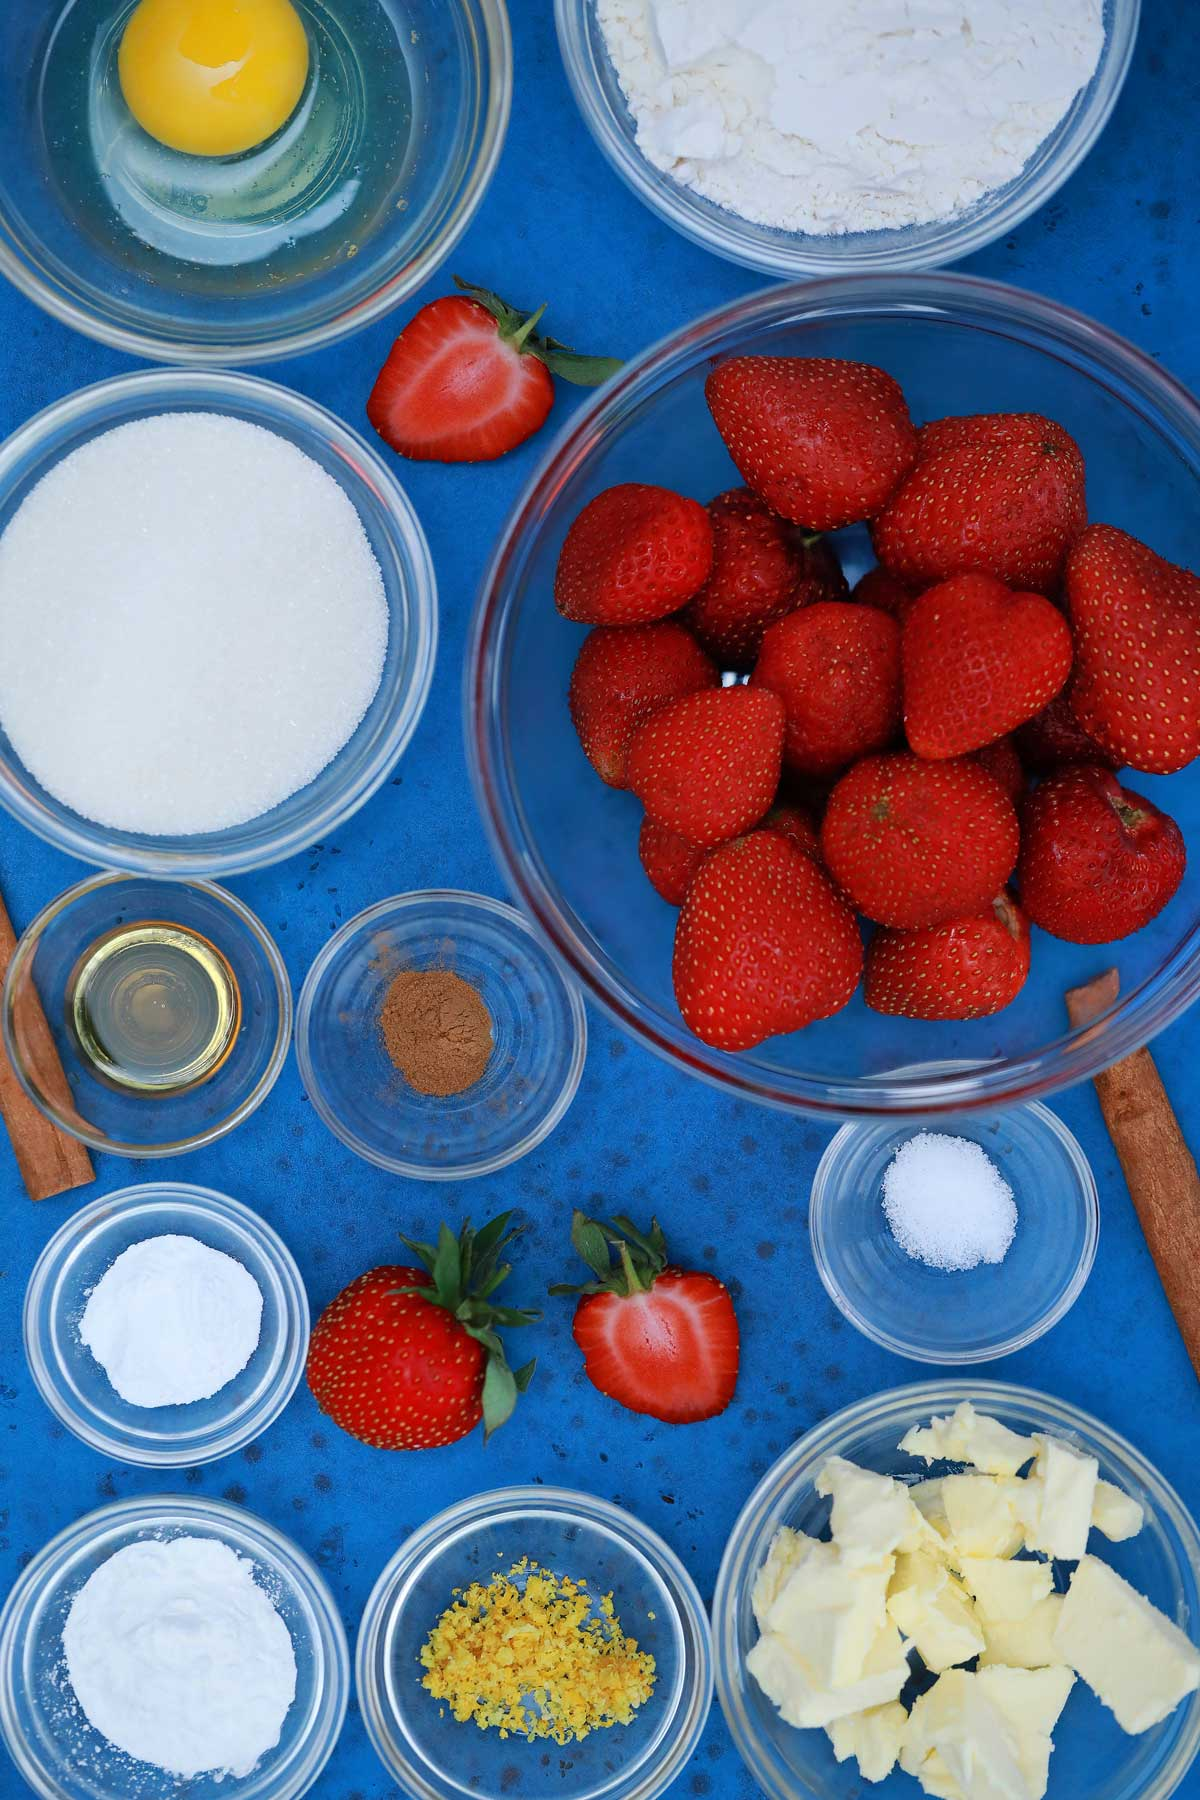 Ingredients for strawberry dessert bars